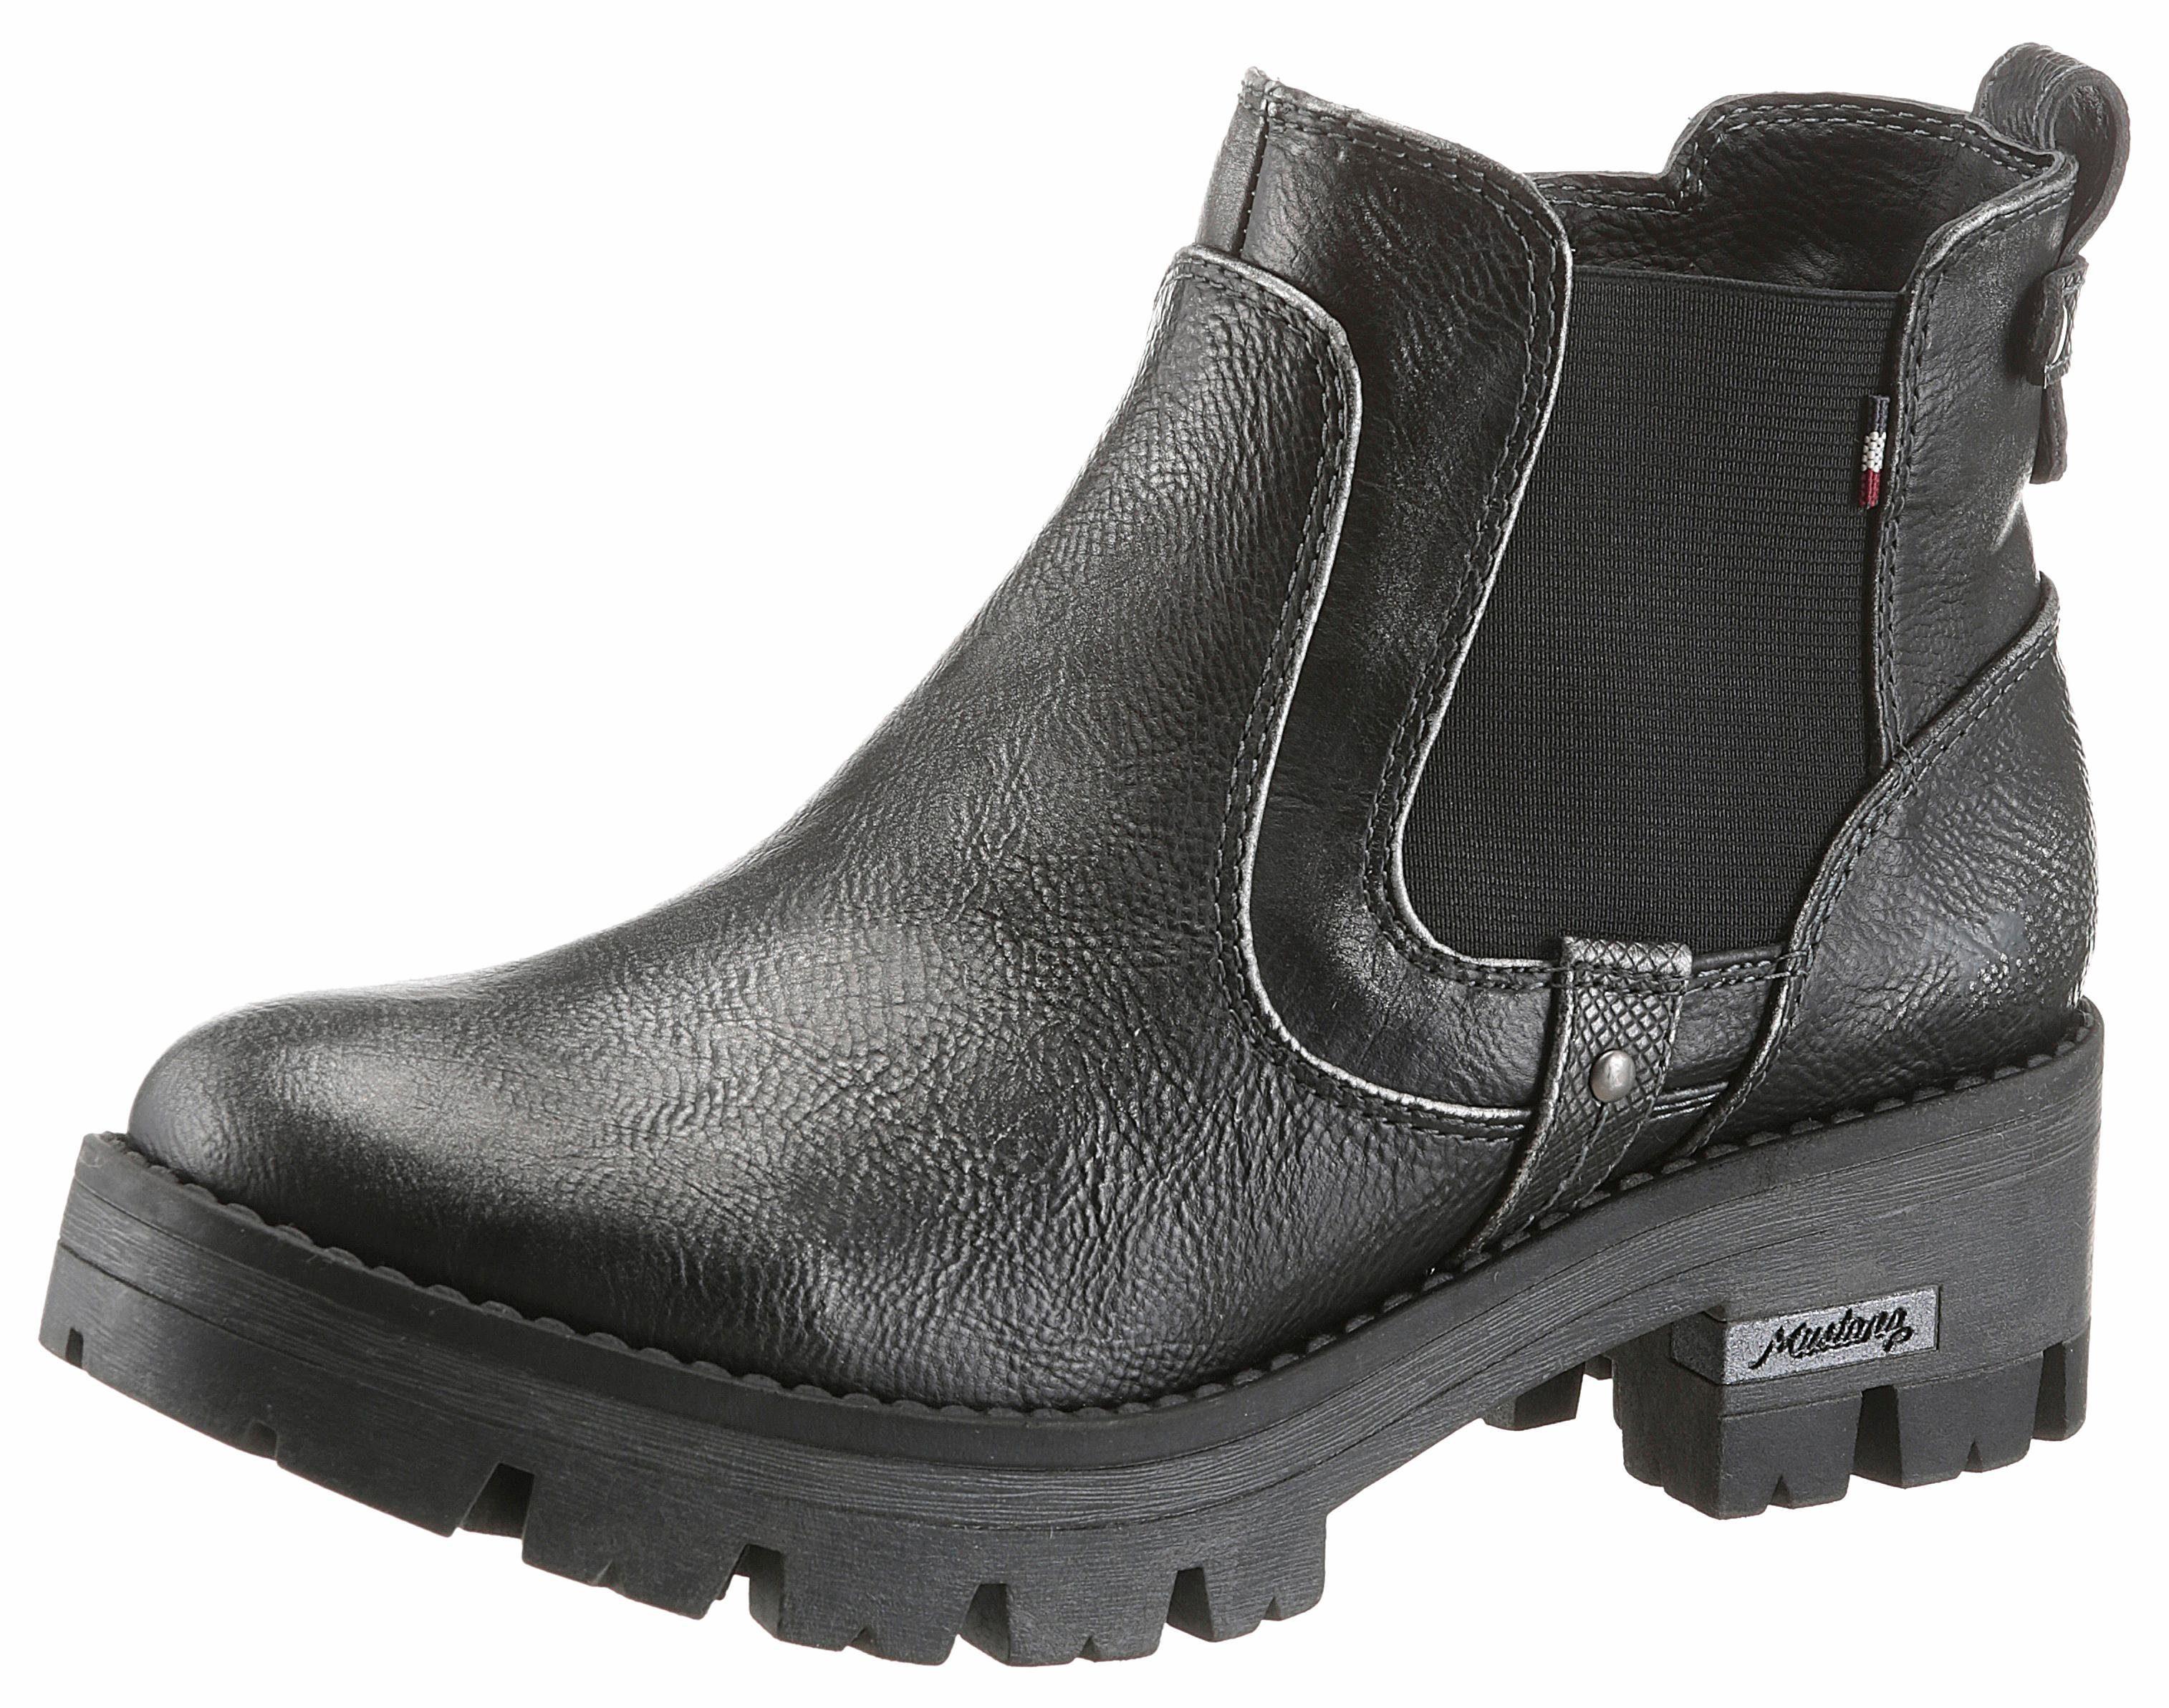 Mustang Shoes Chelseaboots, mit Stretcheinsatz  dunkelgrau